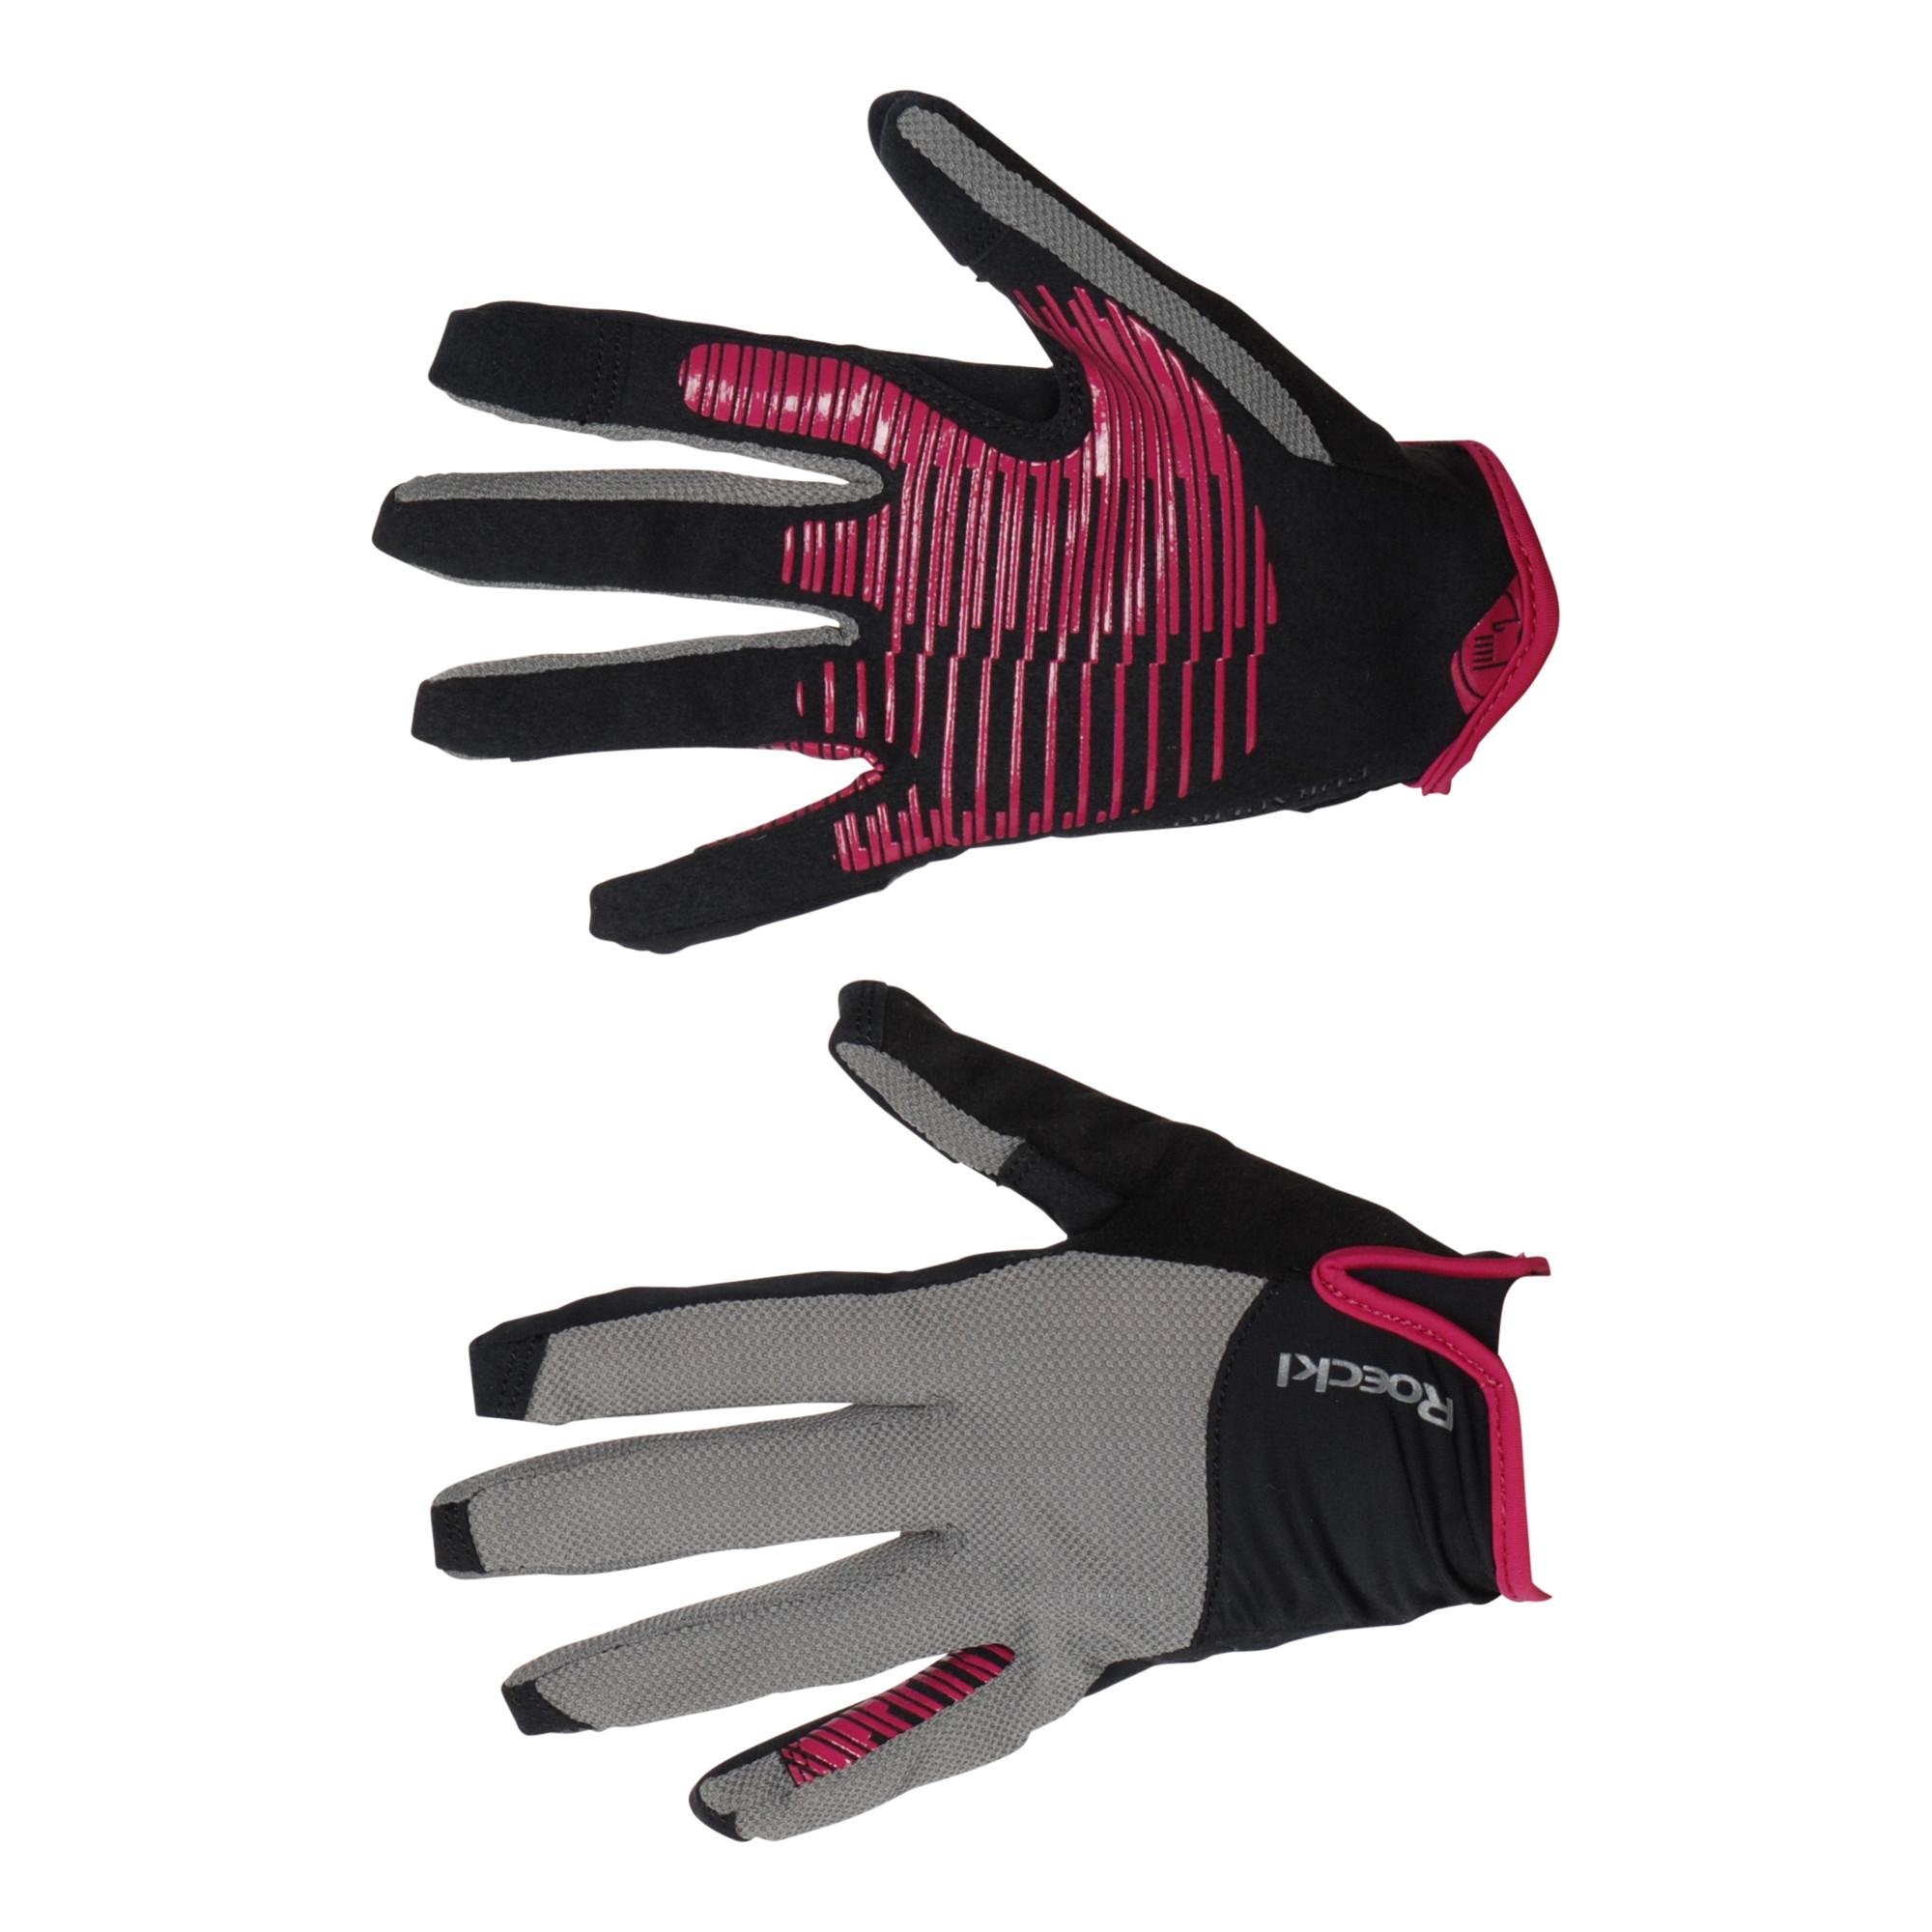 Roeckl Lynn handschoen zwart/grijs maat:8